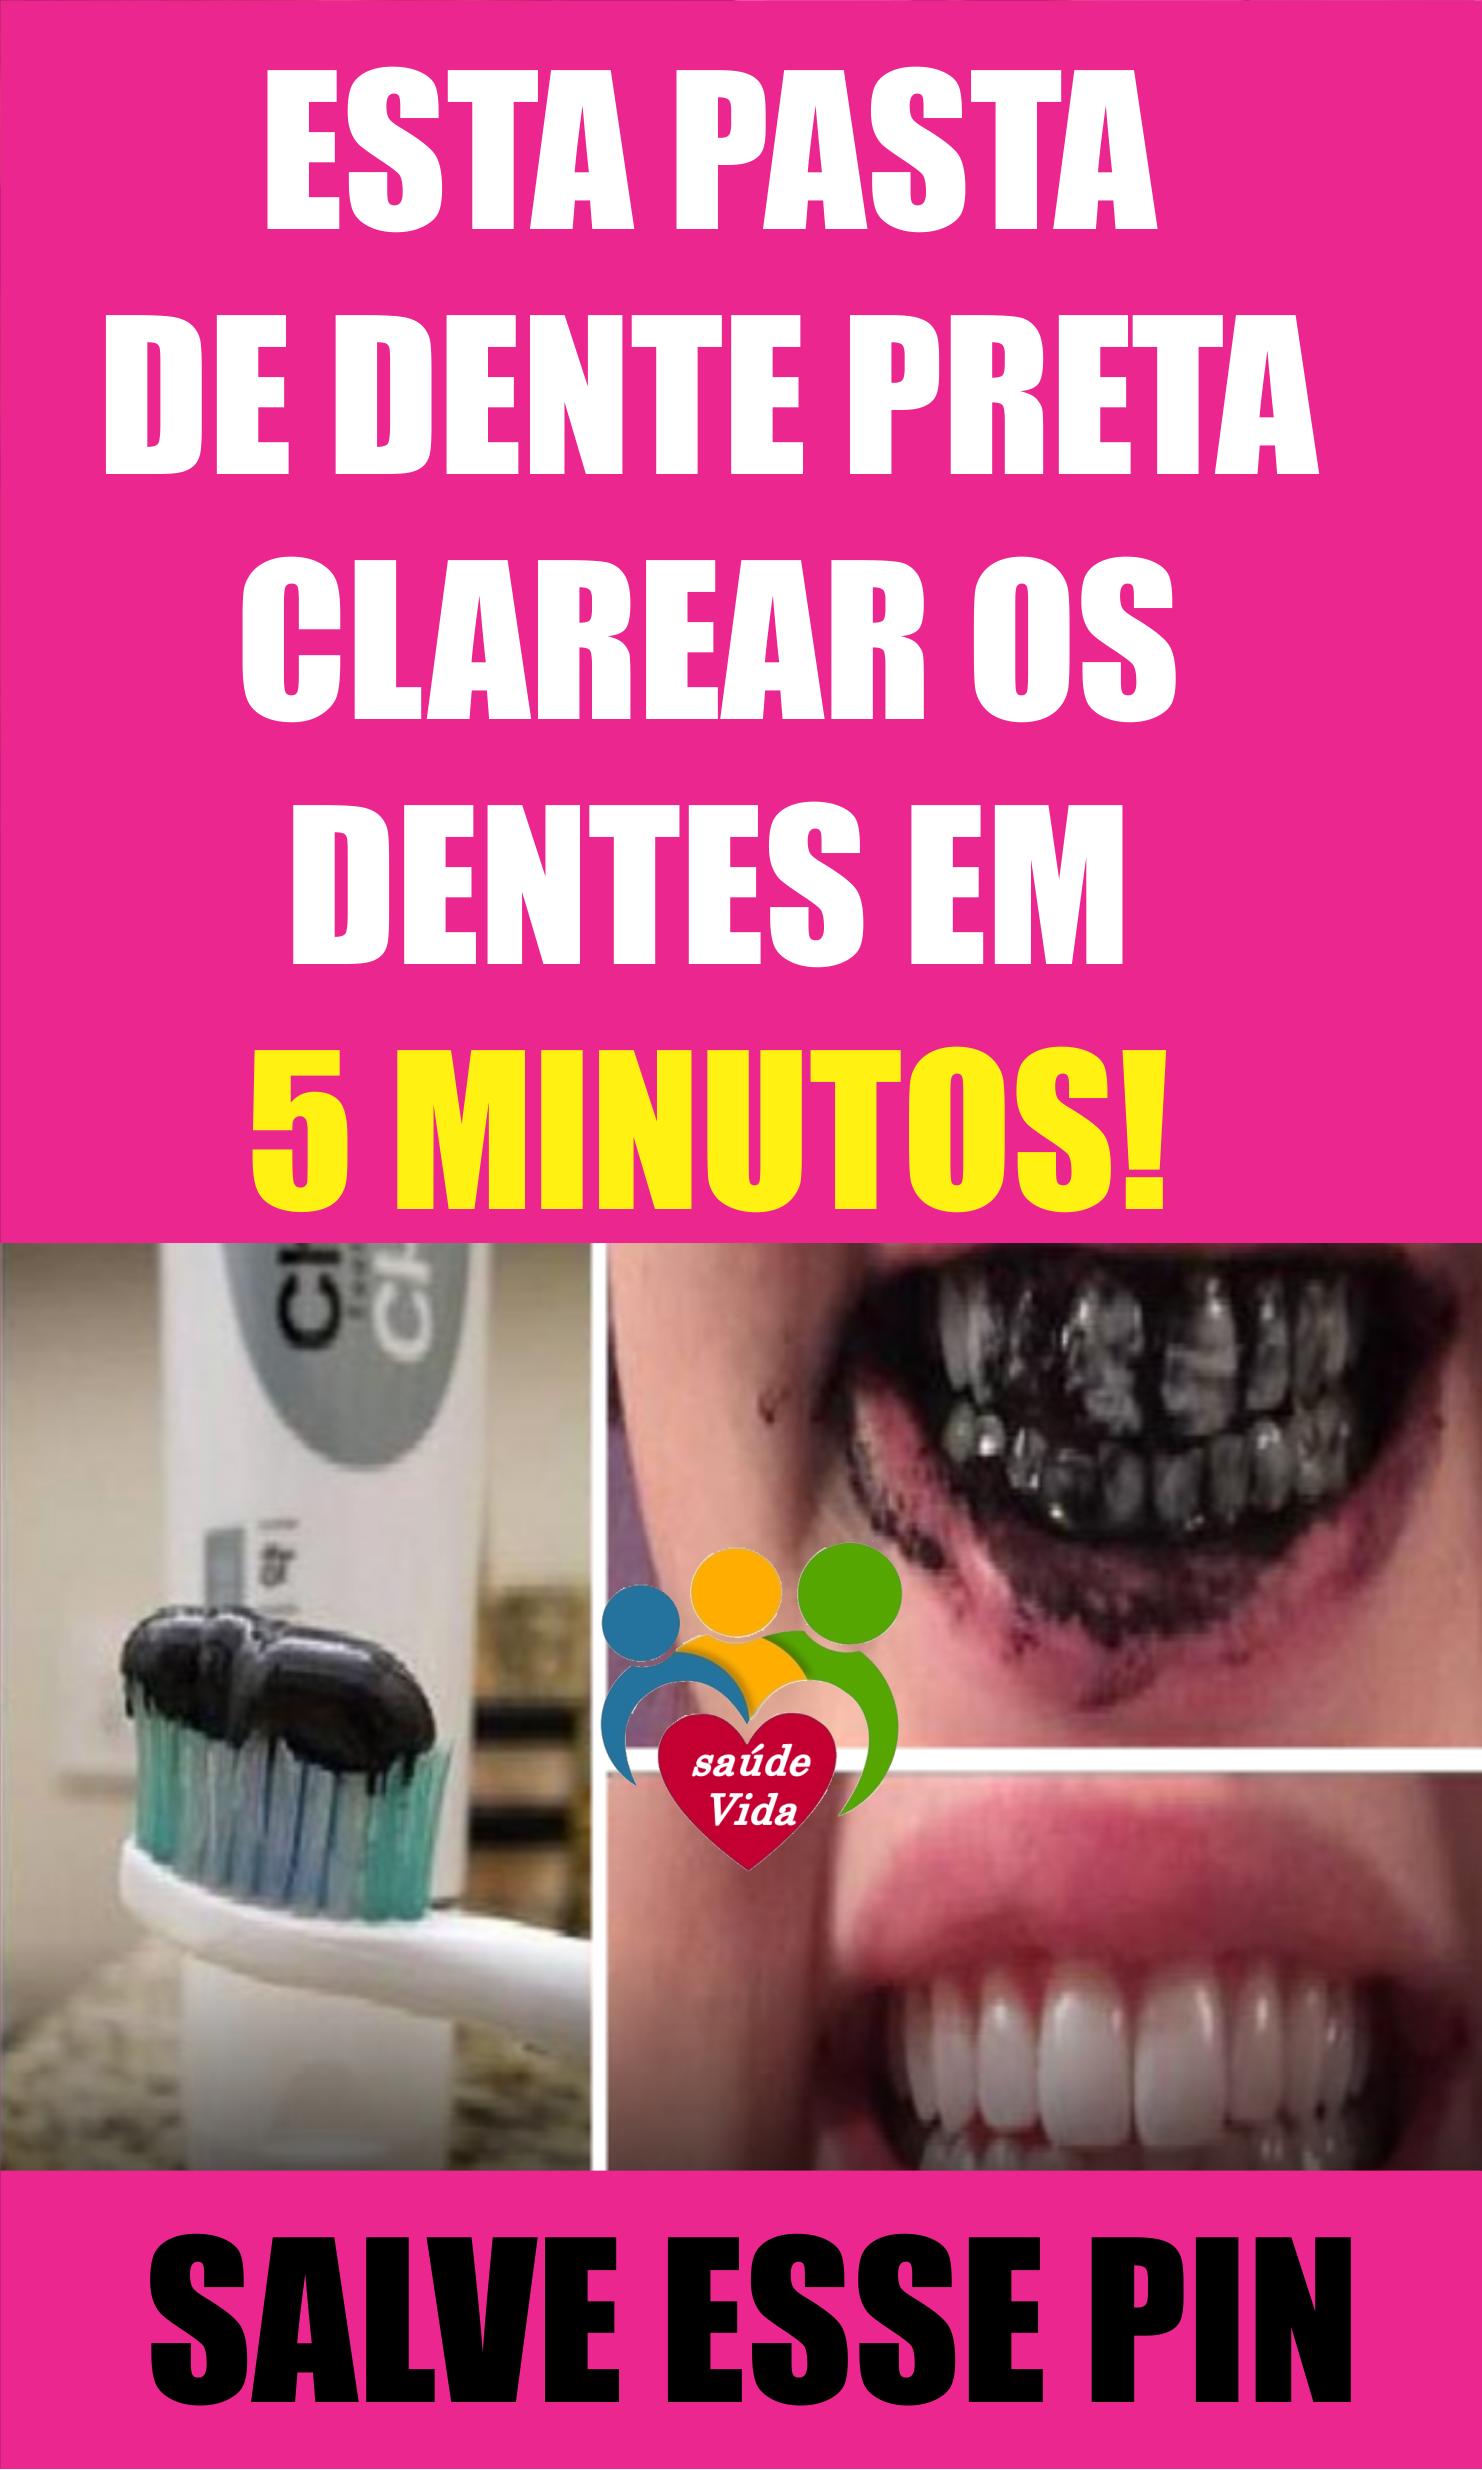 Whitemax Como Clarear Os Dentes Em 5 Minutos Dicas De Beleza